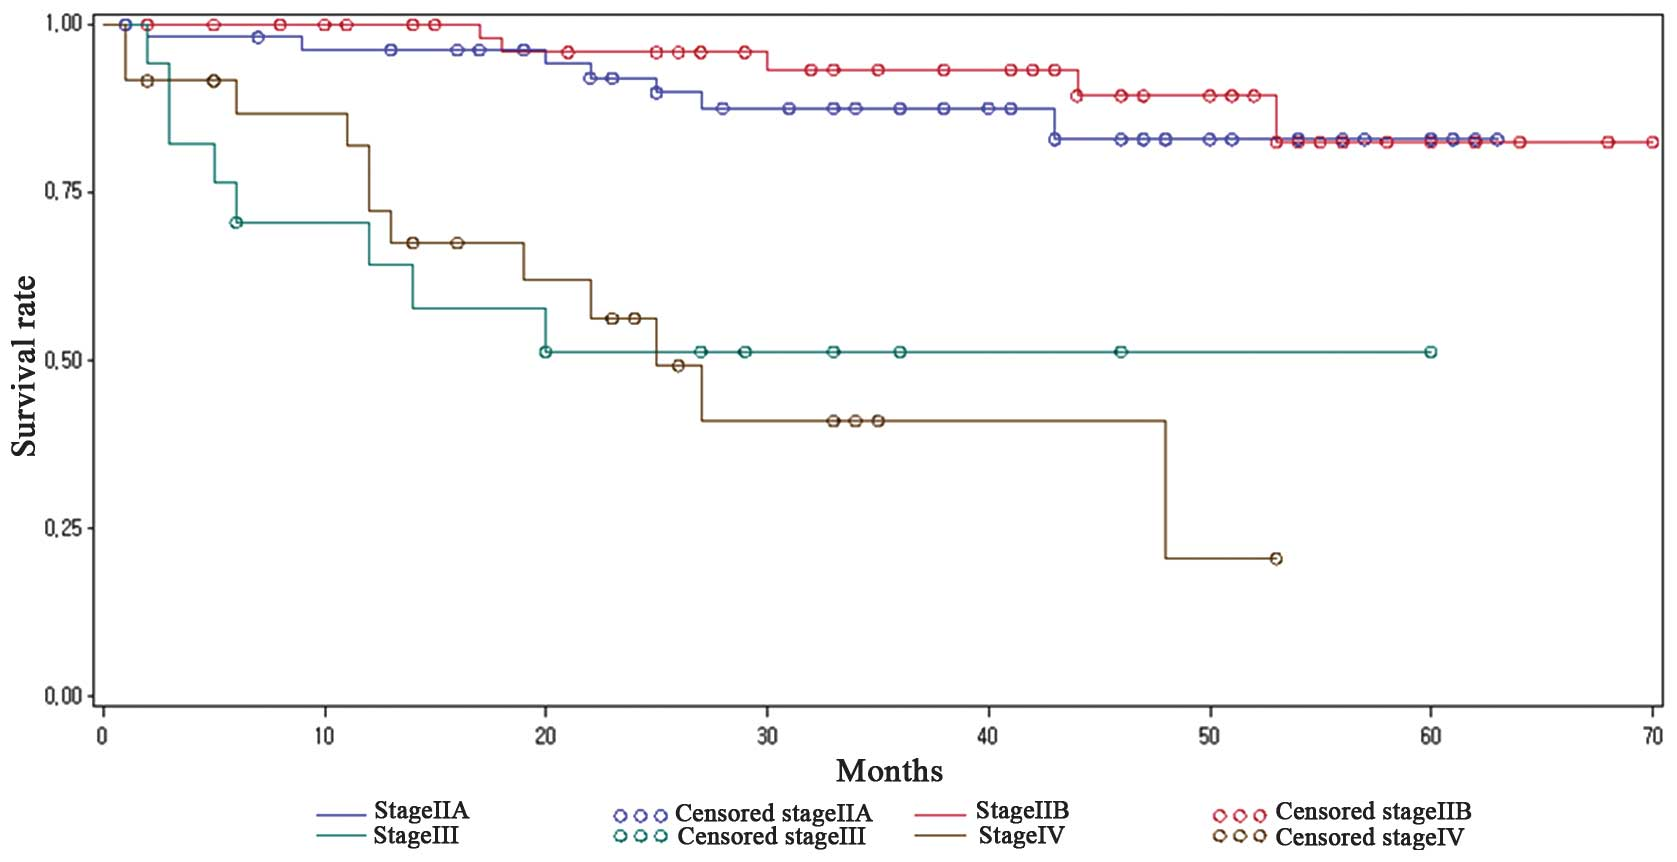 cervical cancer from hpv survival rate cancer of endocrine system